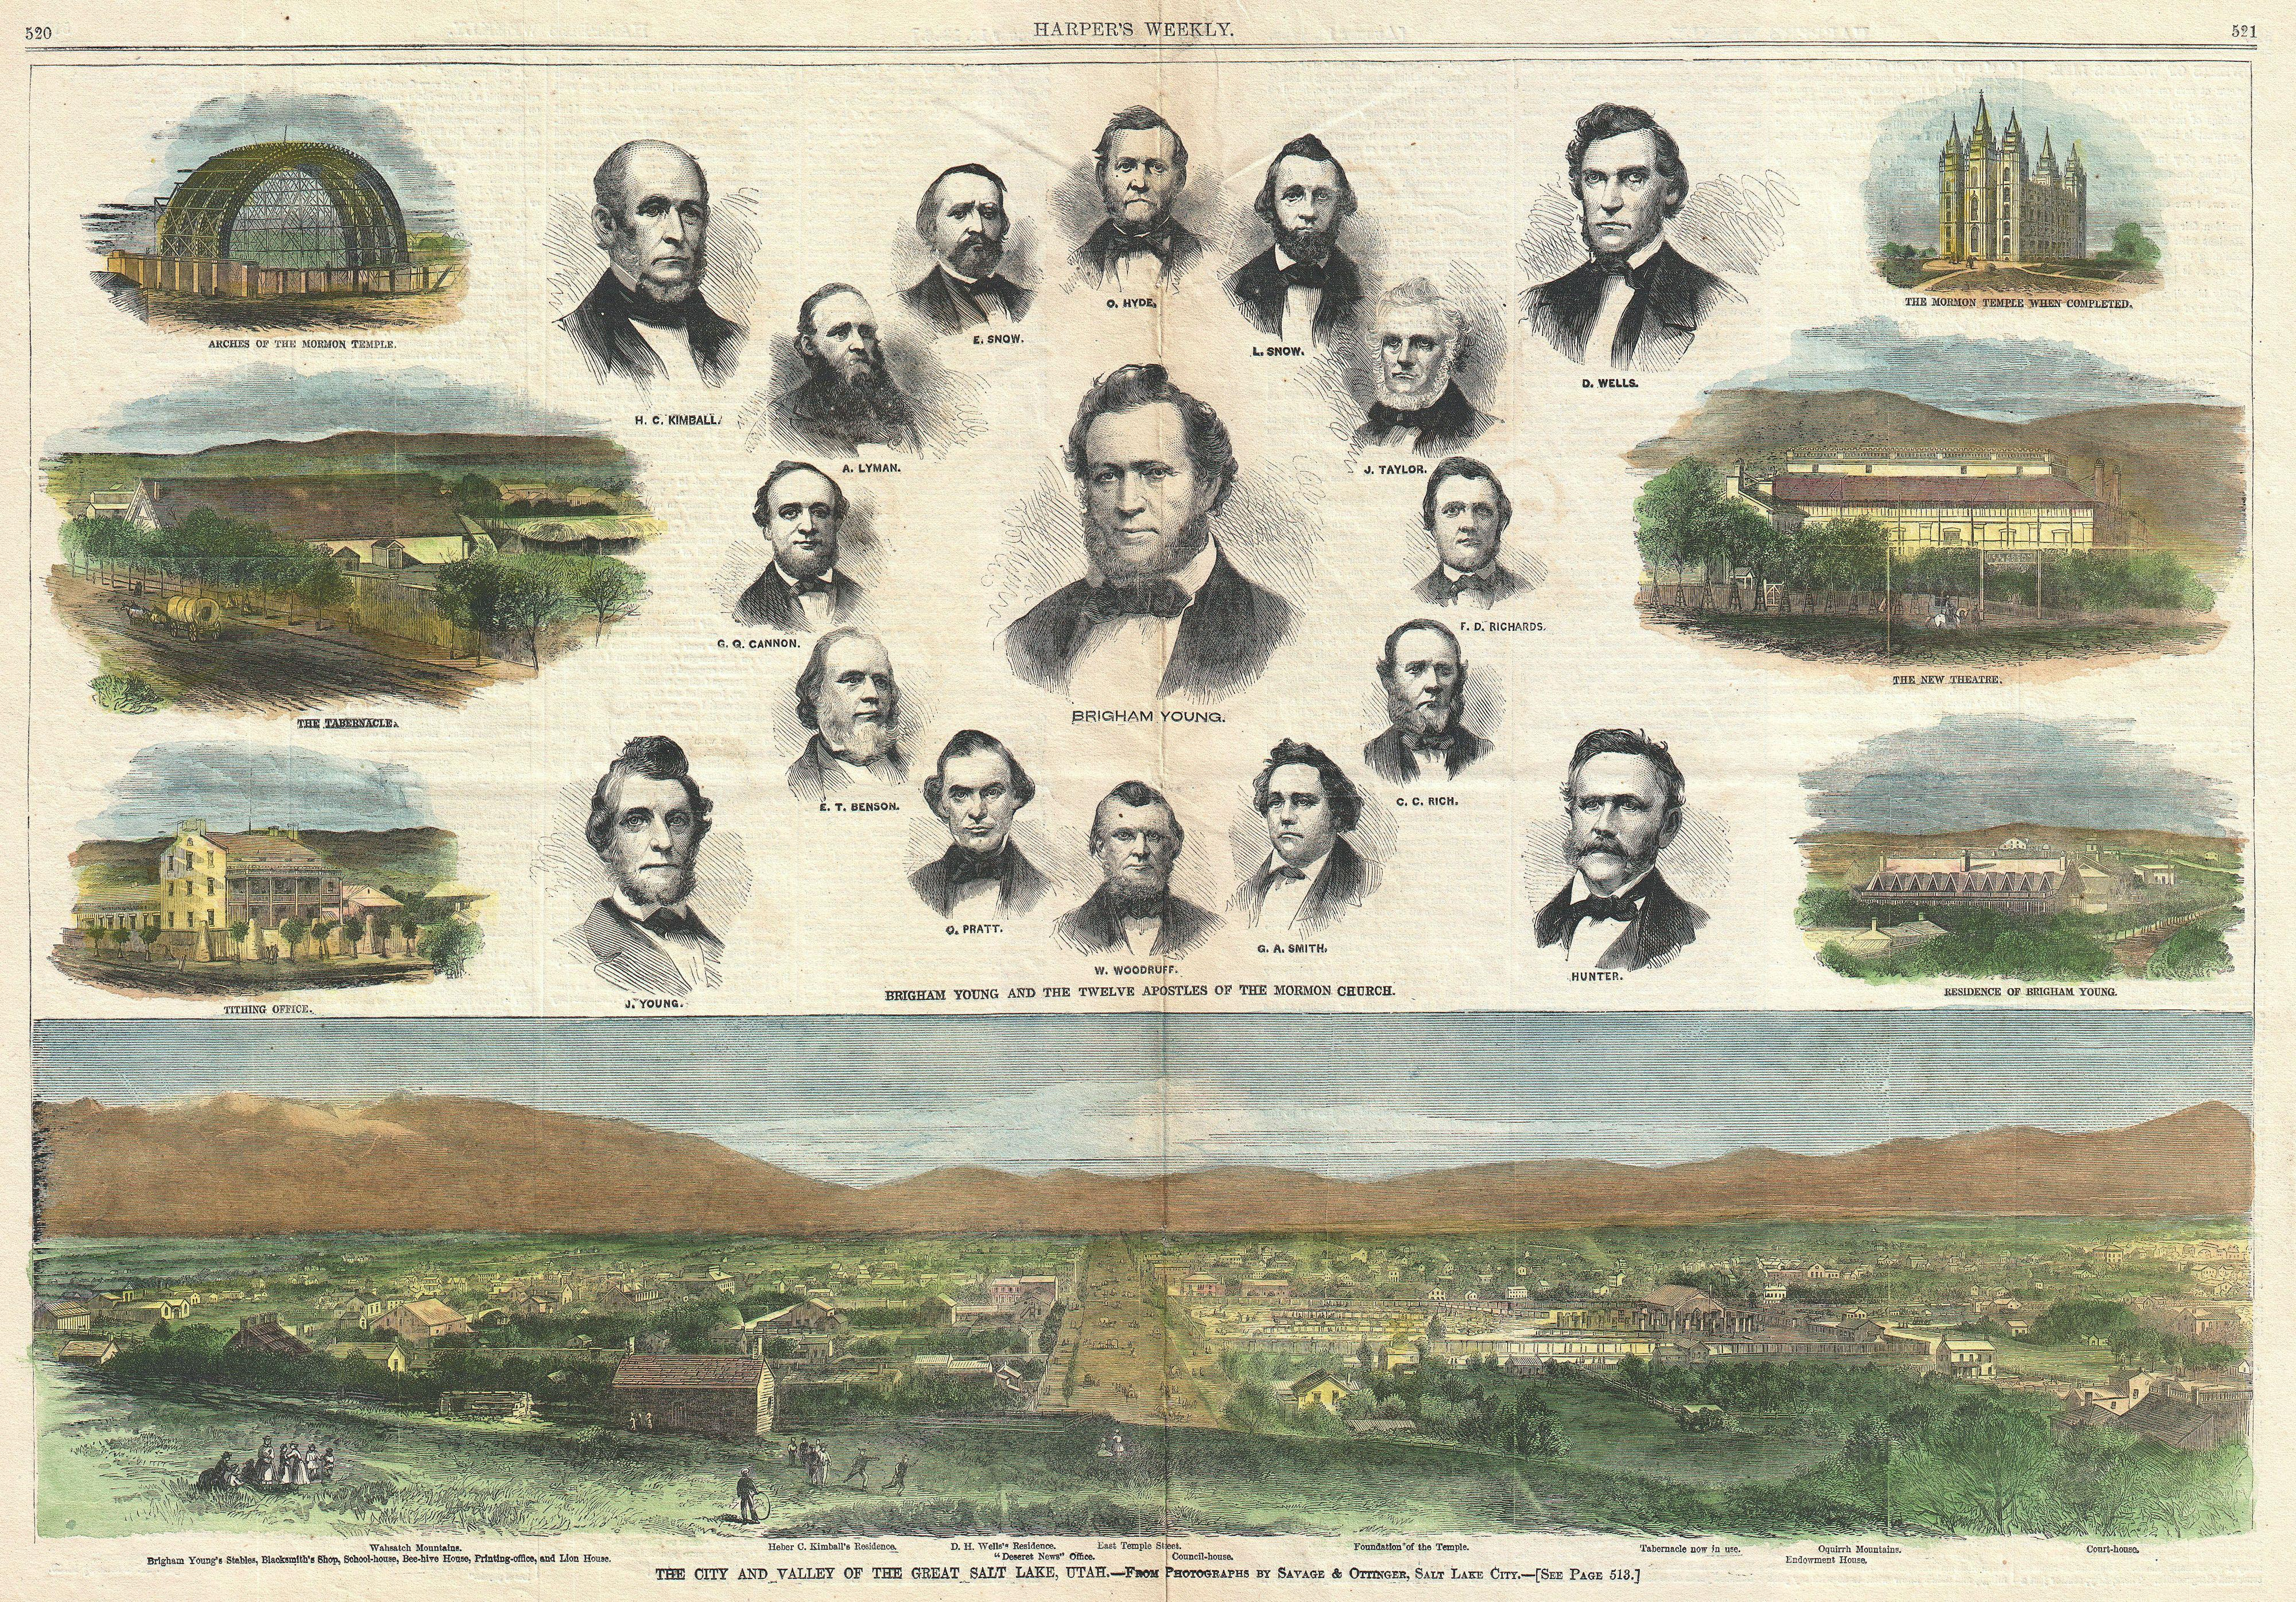 File:1866 Harper's Weekly View of Salt Lake City, Utah w